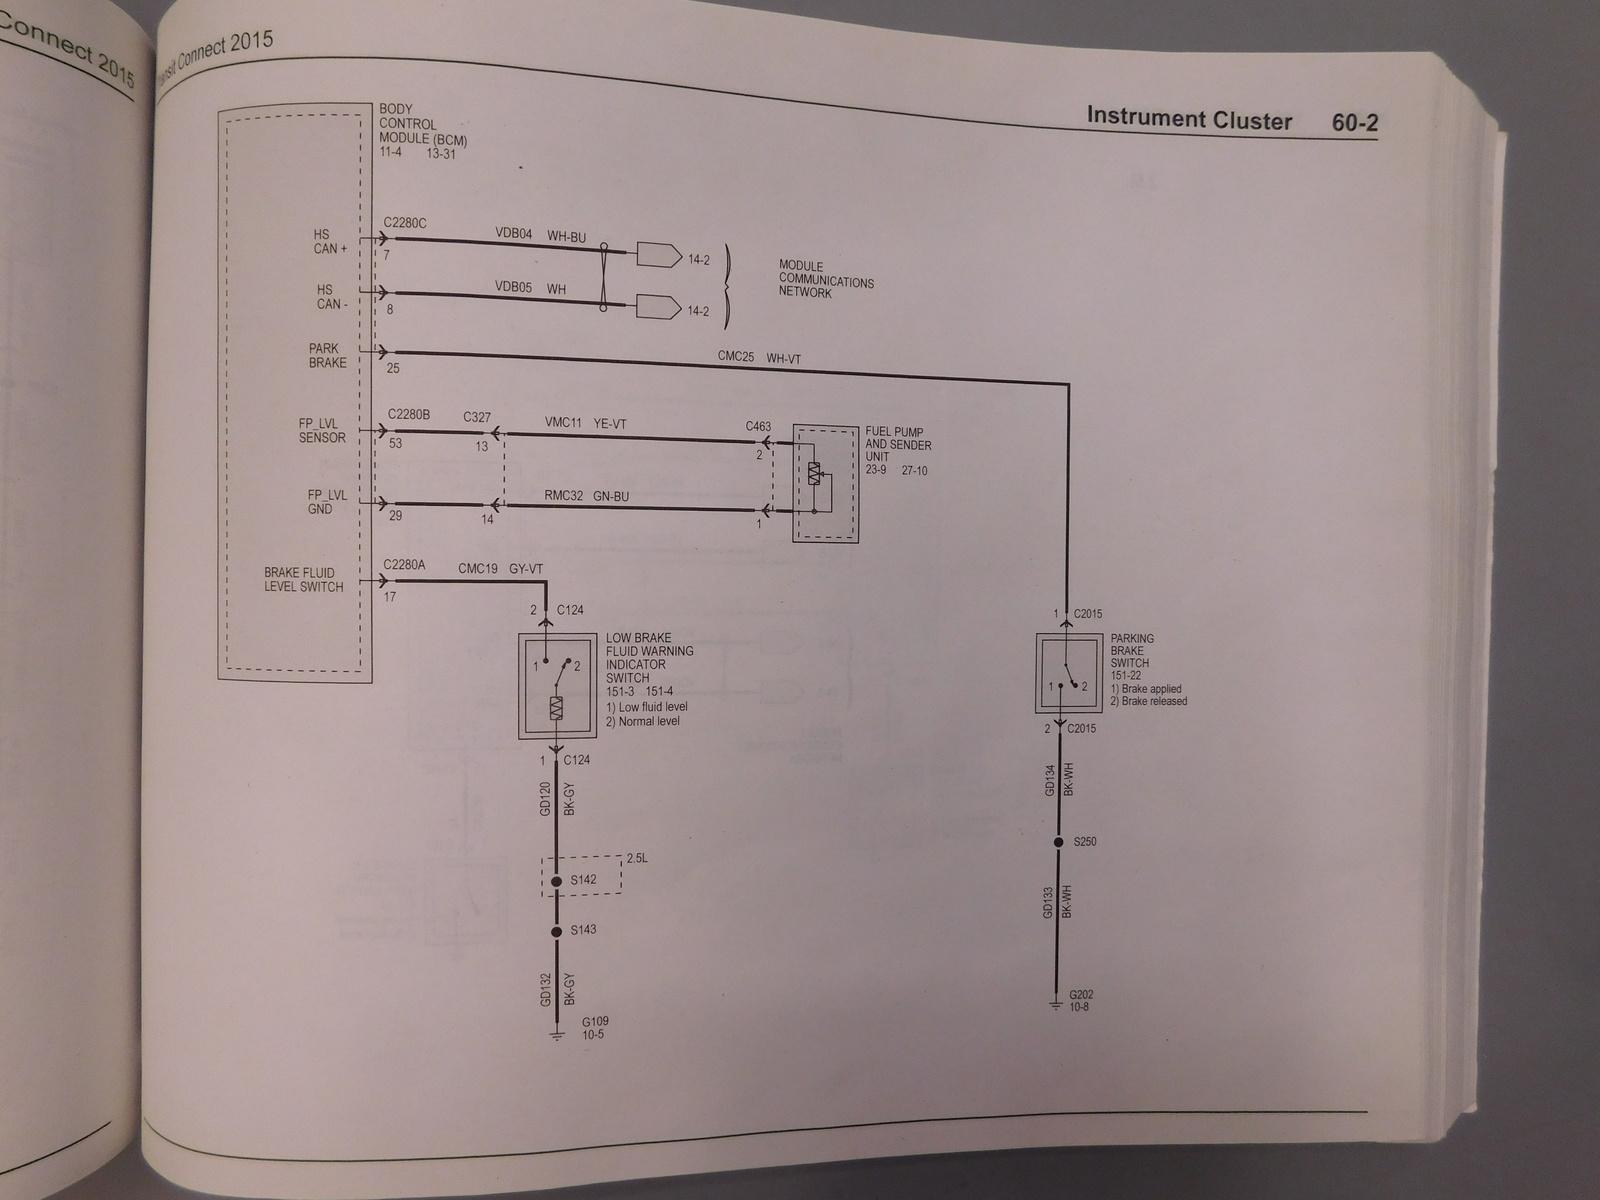 ford transit wiring diagram 2006 chevy silverado 2500hd stereo 2015 parking brake forum